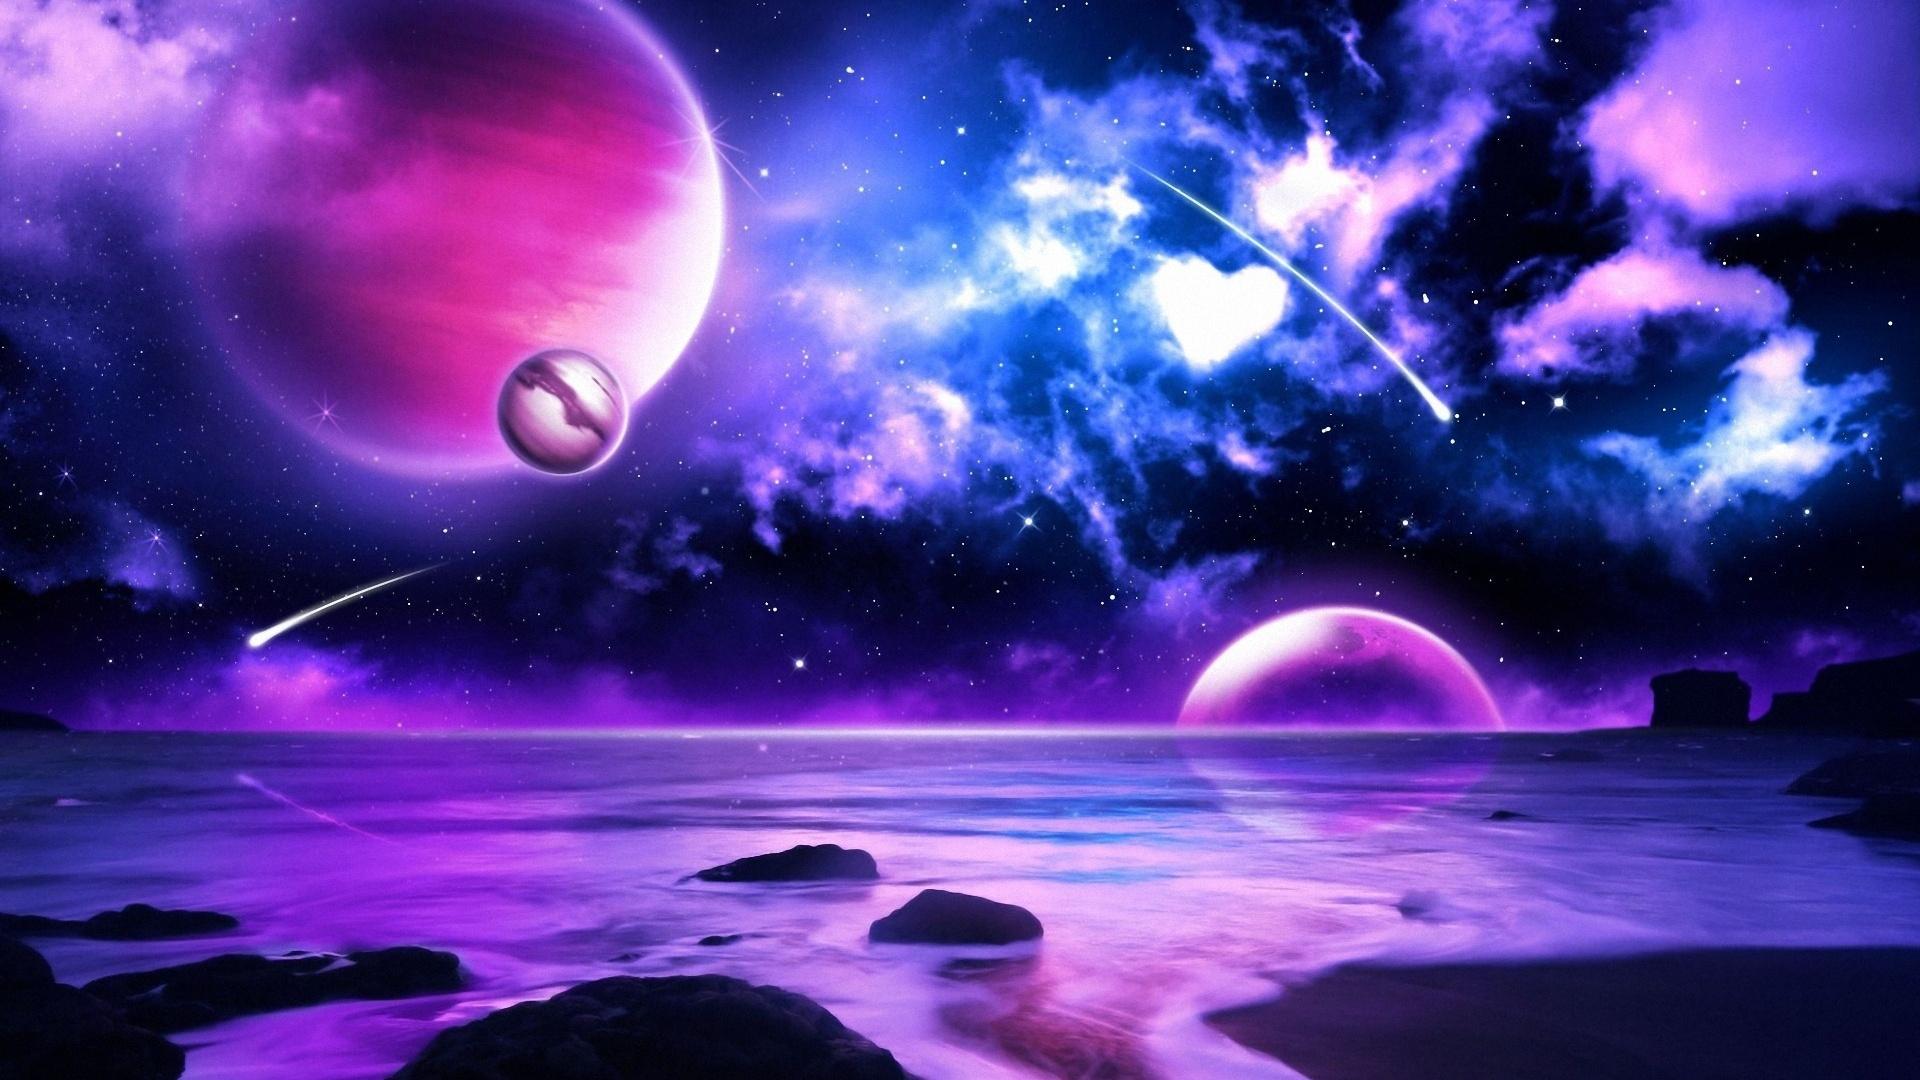 hd background purple galaxy space sky stars in blue pink